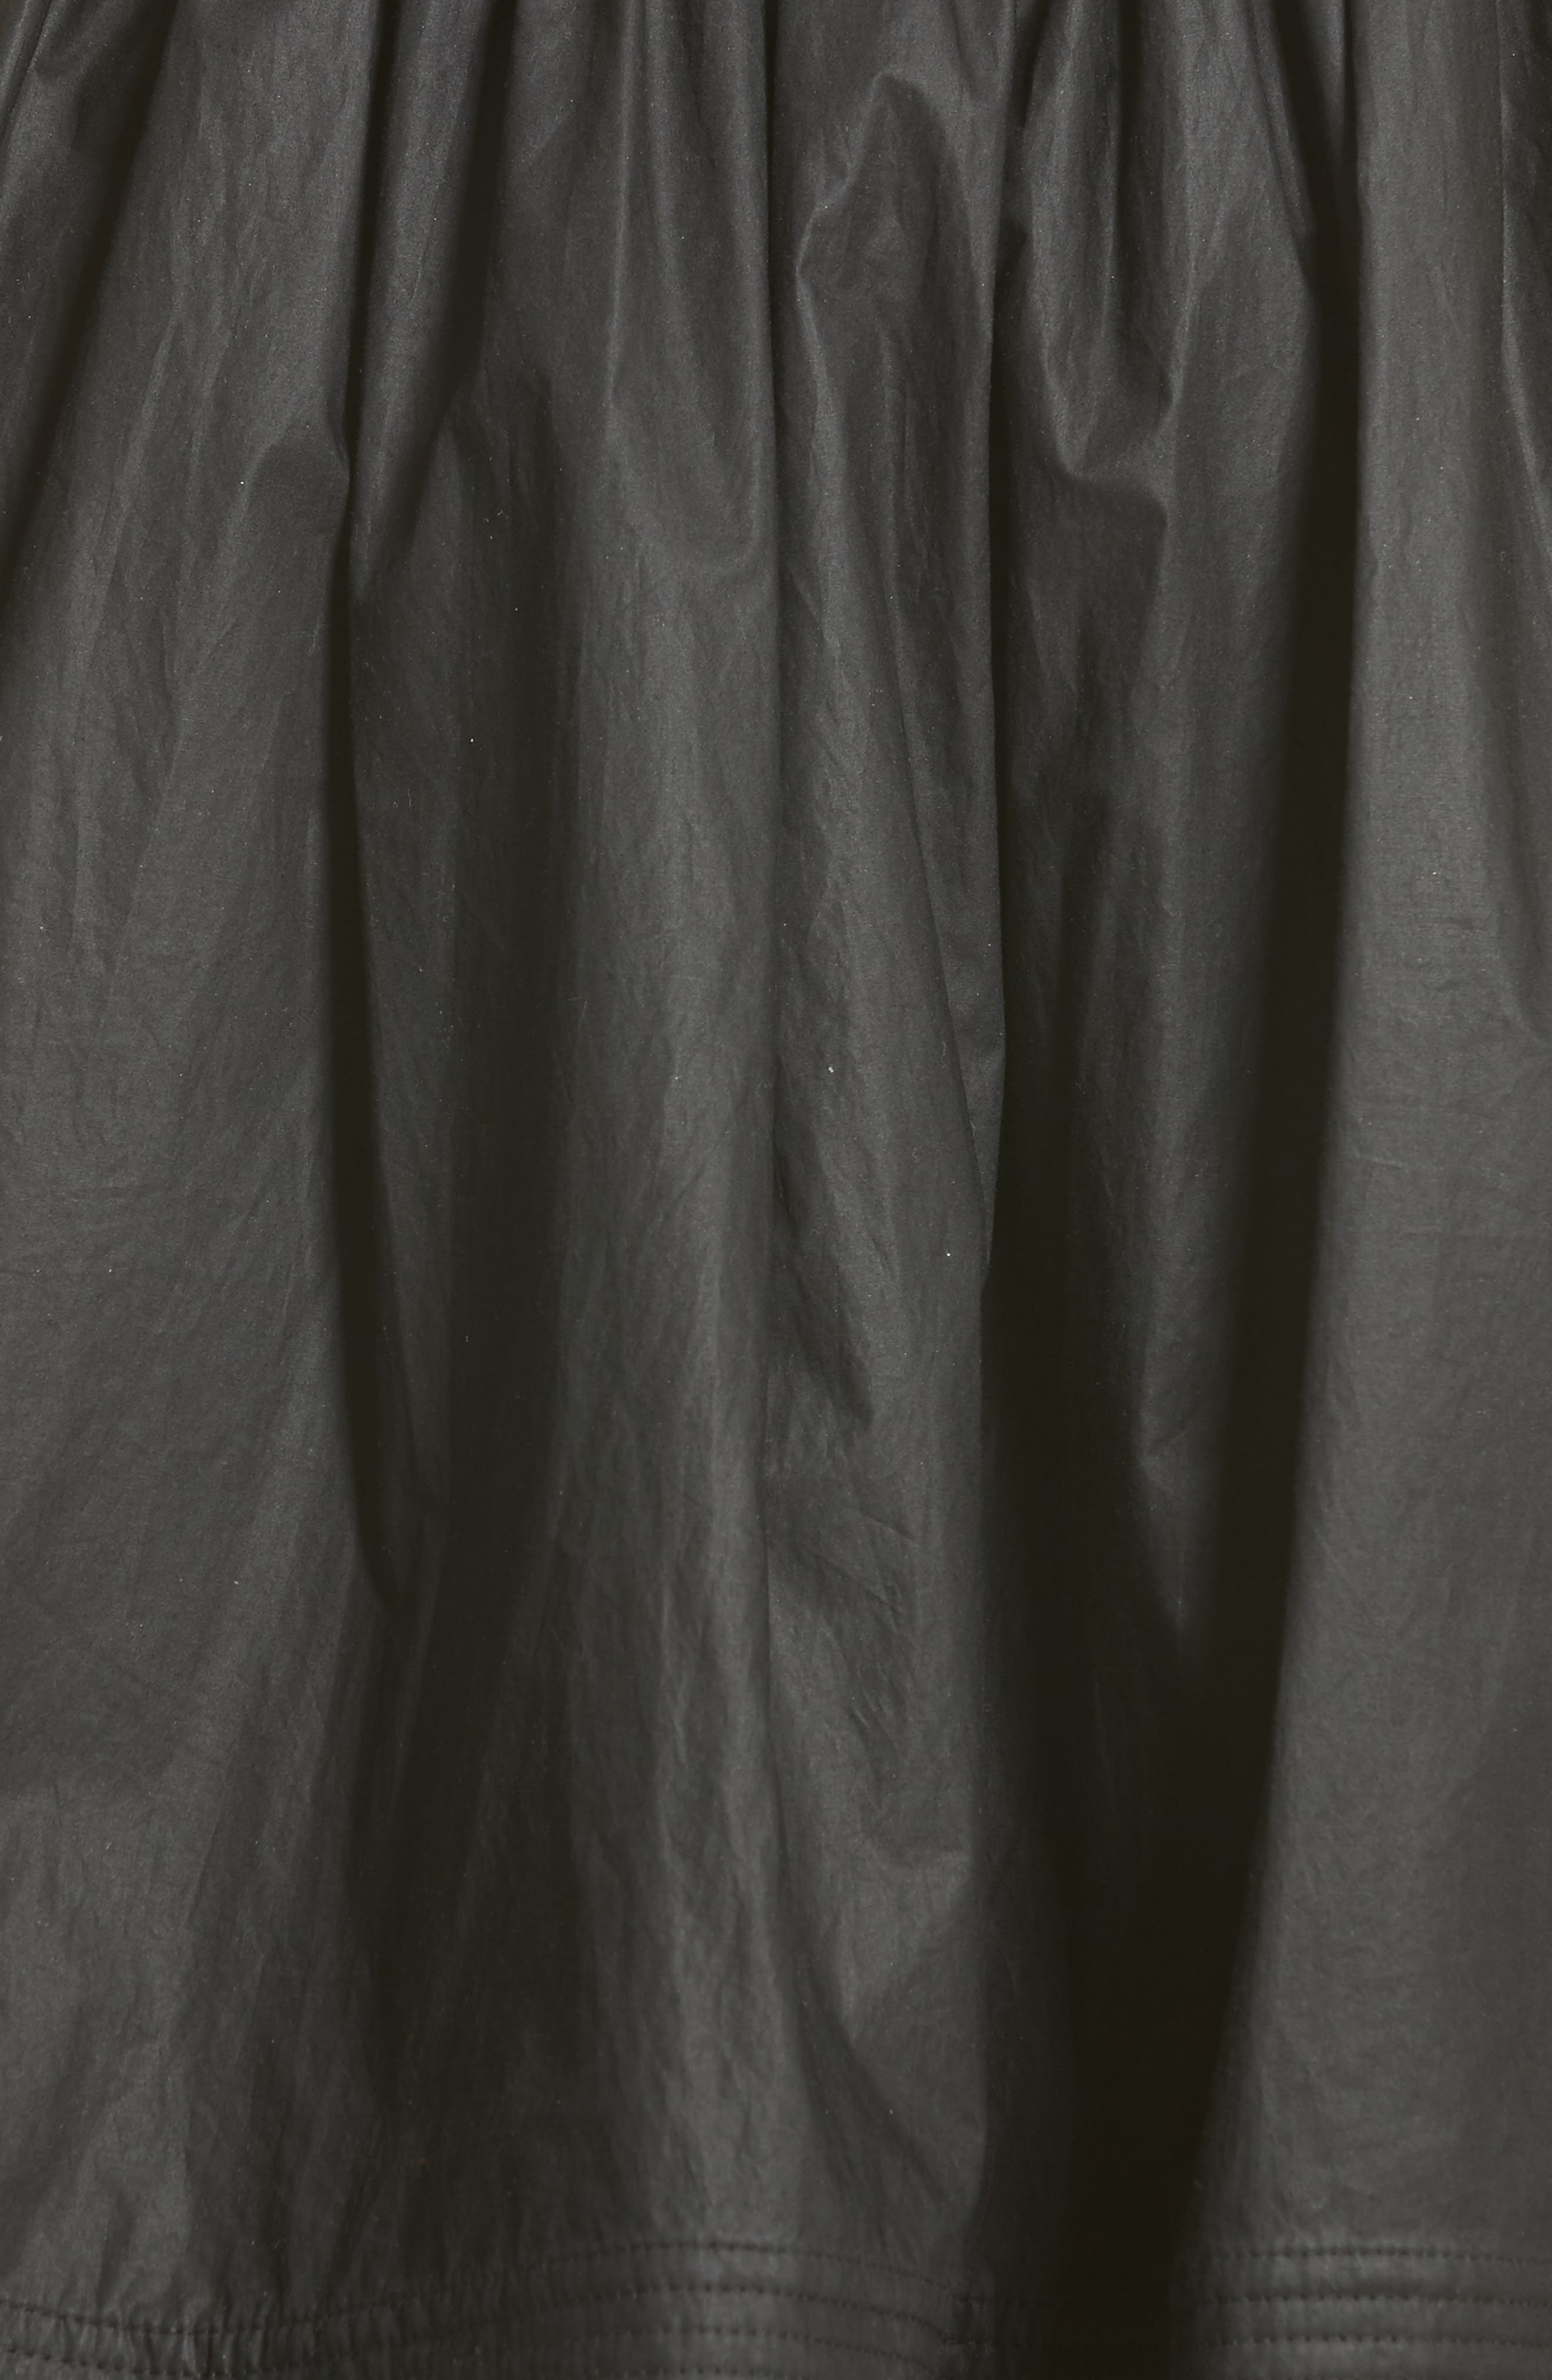 Gonna Cotton A-Line Skirt,                             Alternate thumbnail 5, color,